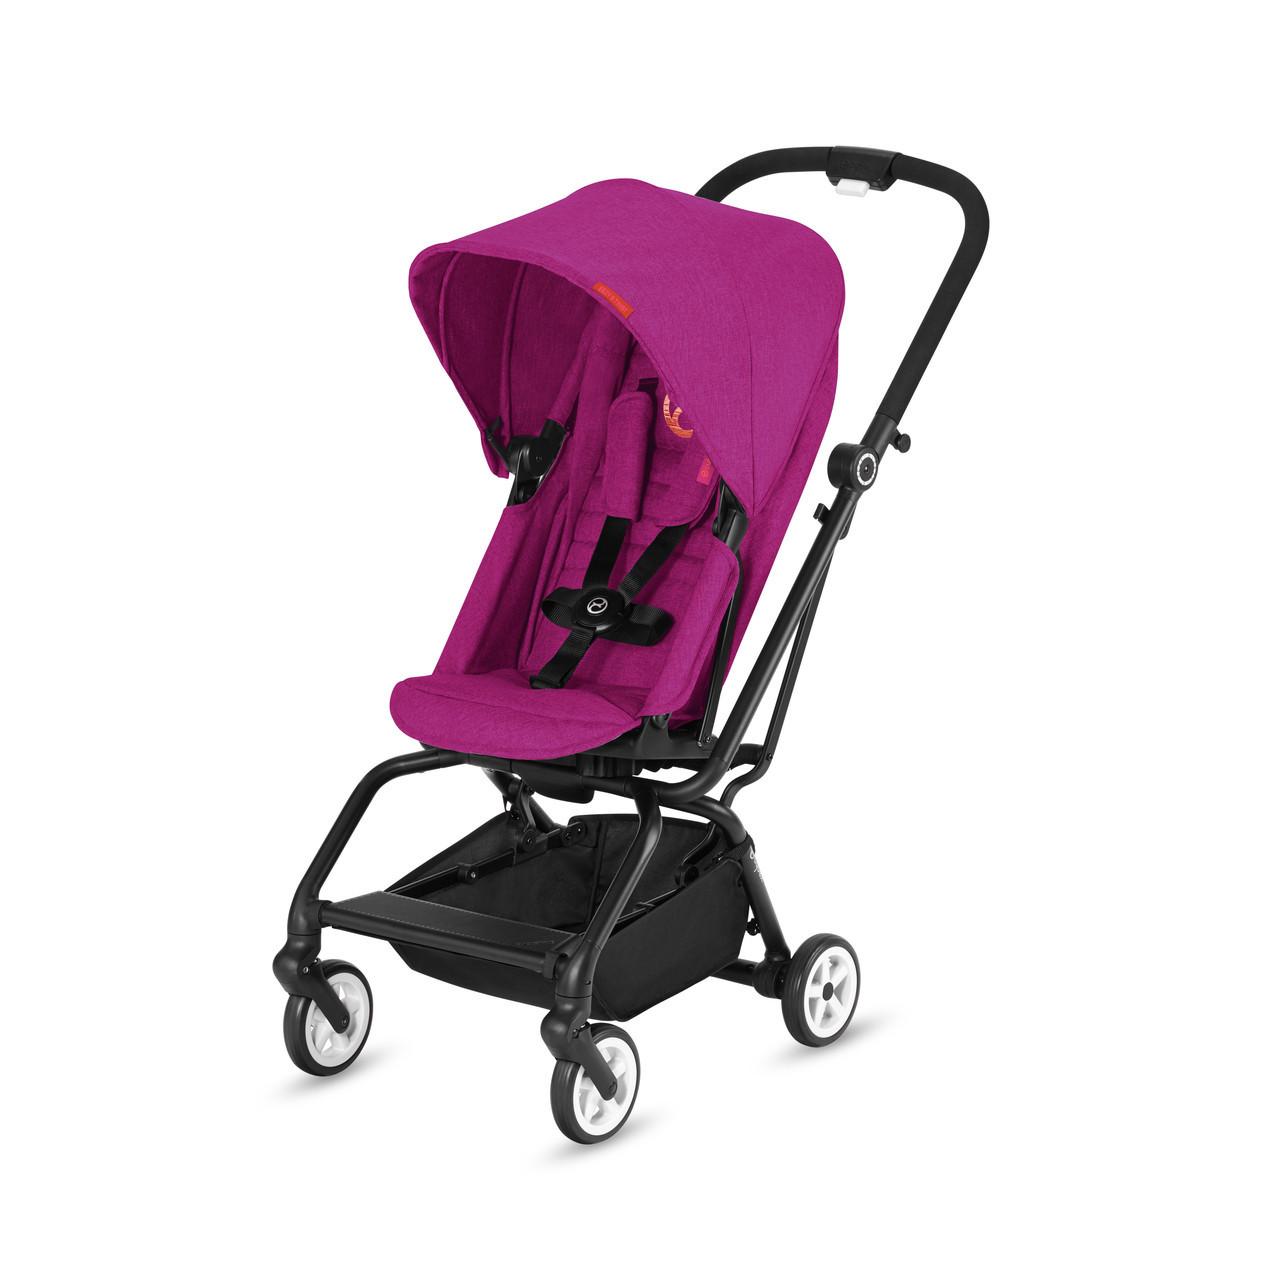 Прогулочная коляска Eezy S Twist, цвет Passion Pink Cybex